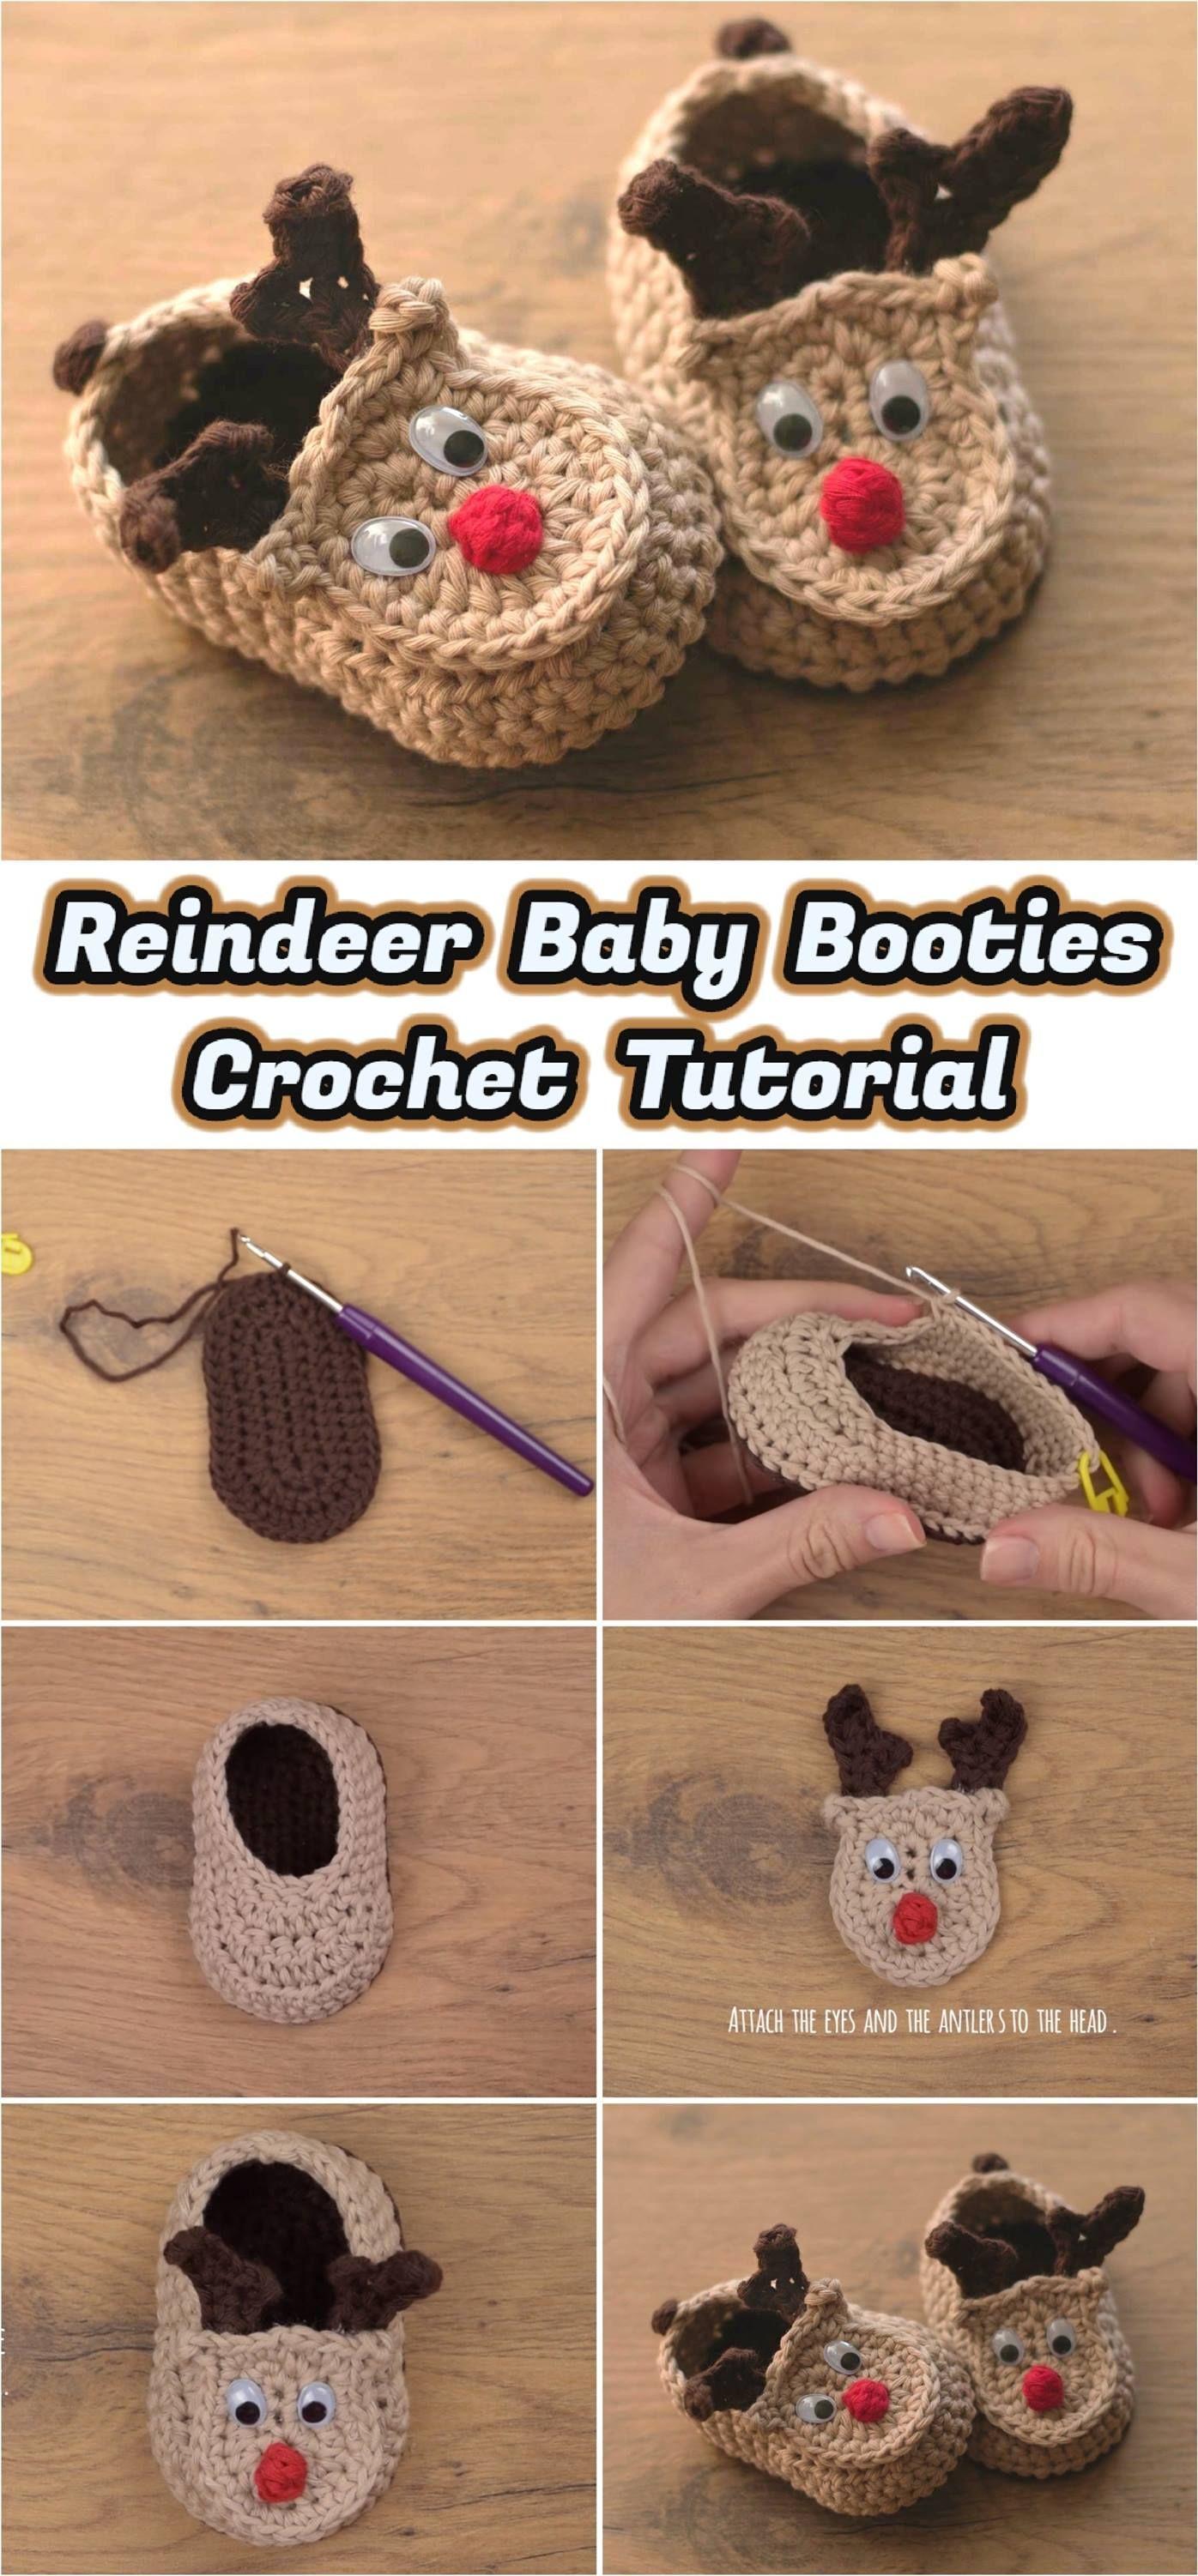 Crochet Rudy The Reindeer Baby Booties | Tejido, Zapatos y Bebe